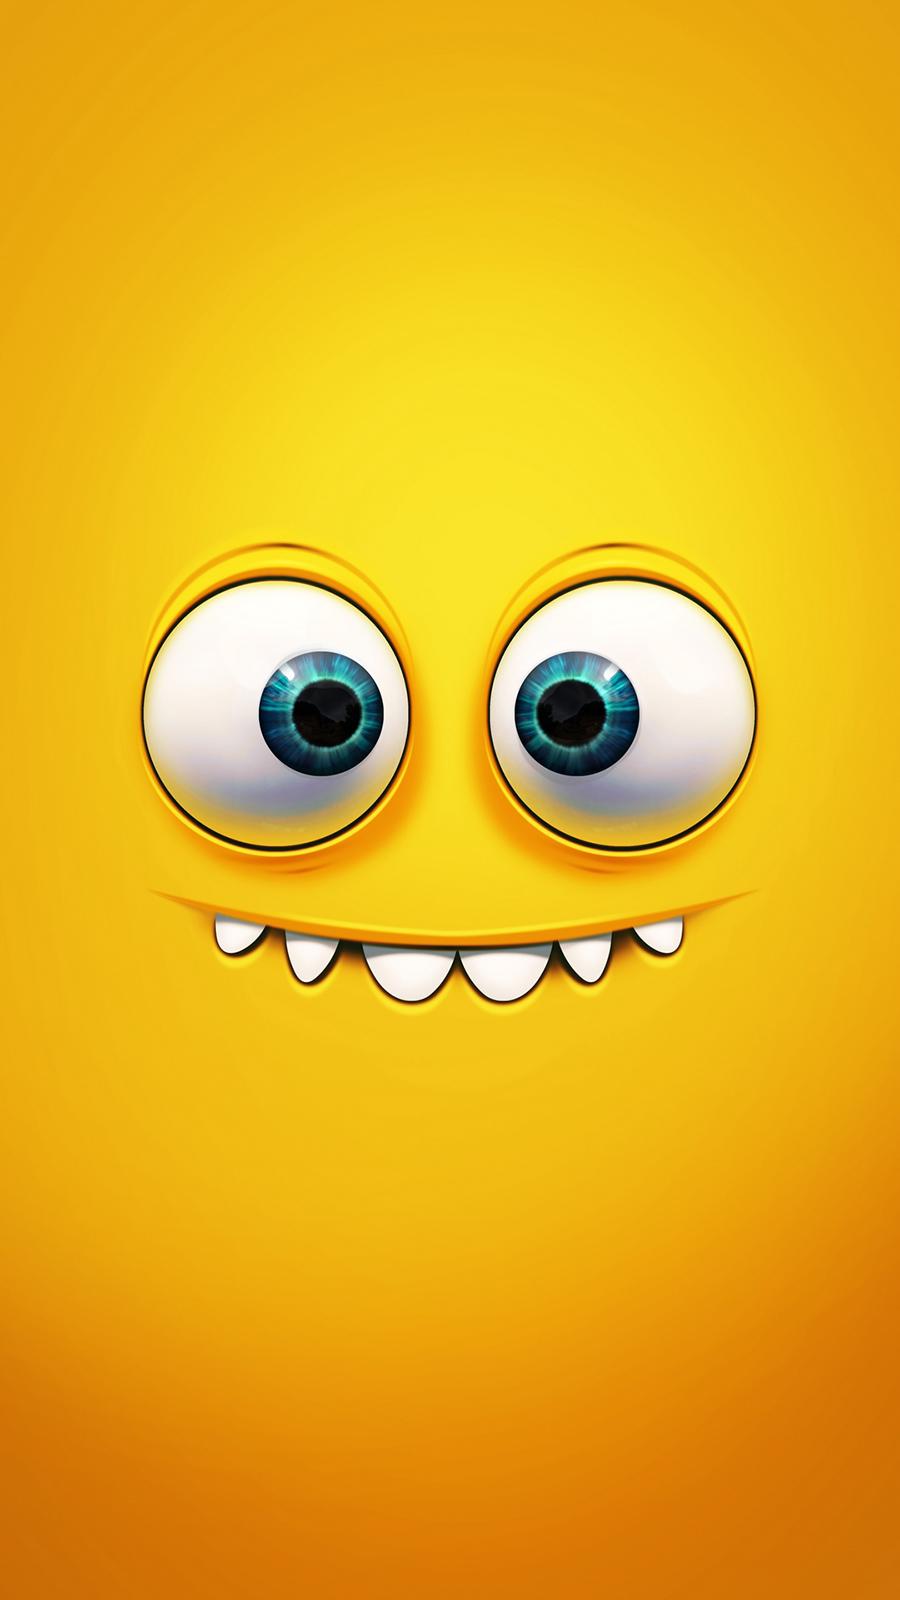 Smile Emoji Full HD Wallpapers Free Download